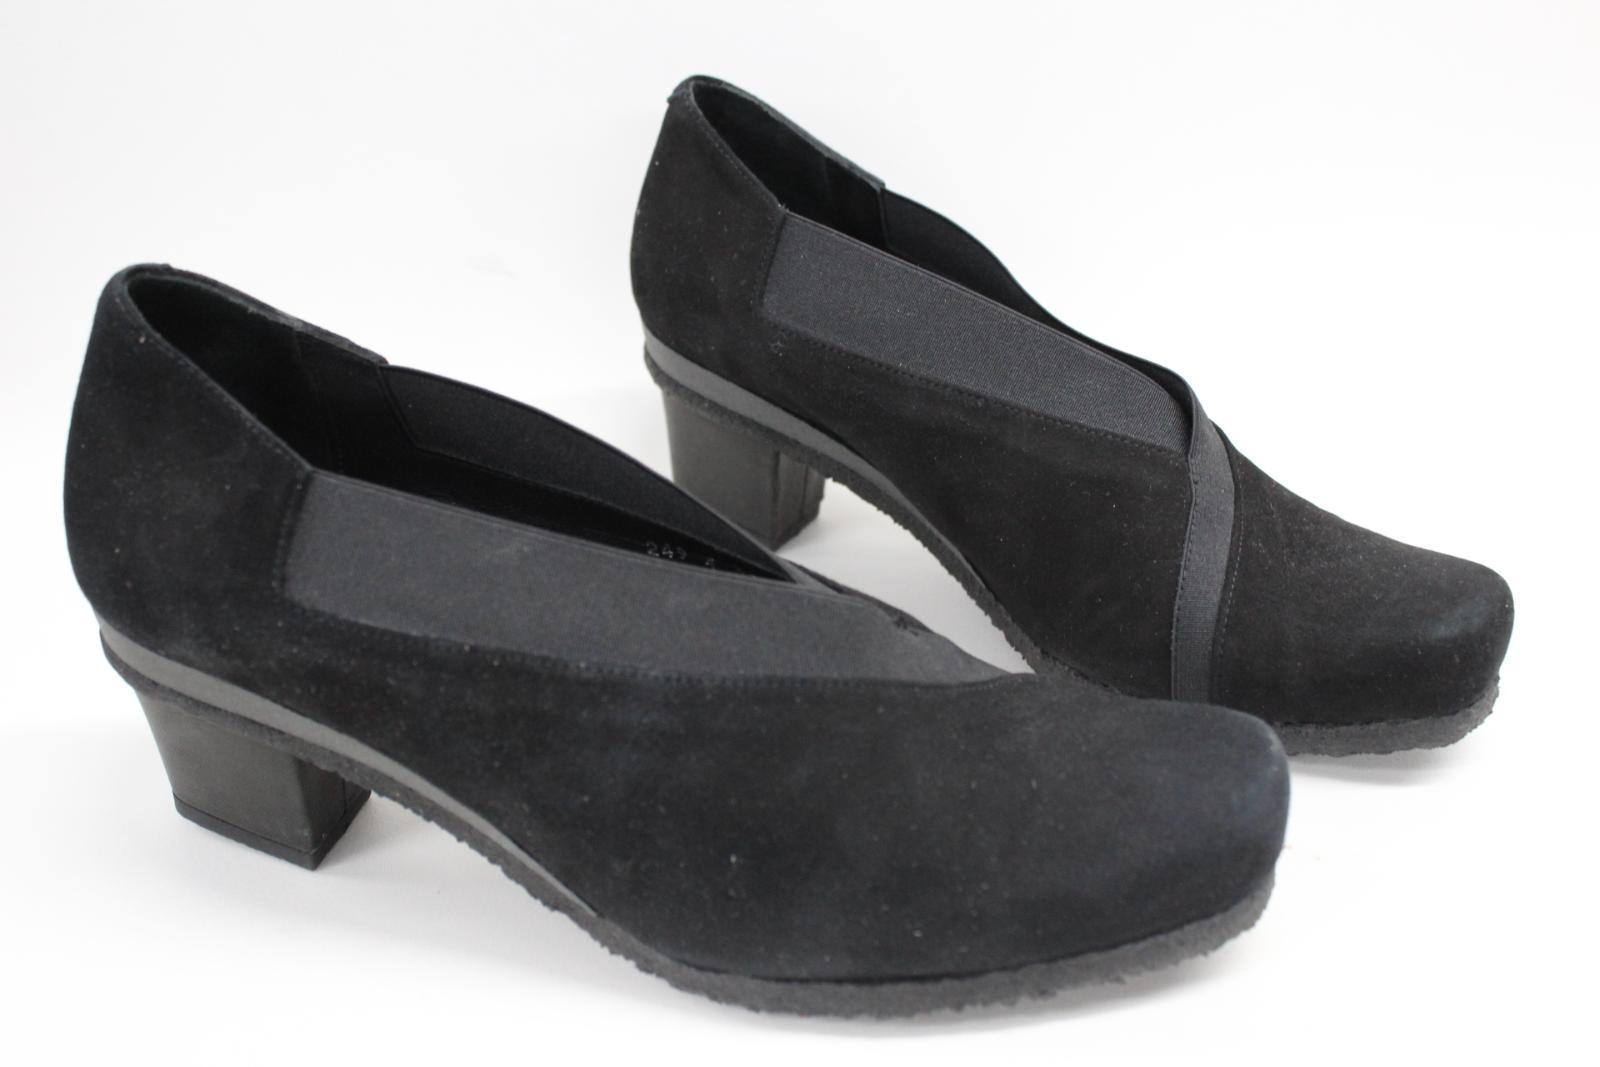 AUDLEY-London-Ladies-Black-Suede-Crossover-Block-Heels-Shoes-Size-EU39-UK6 thumbnail 2